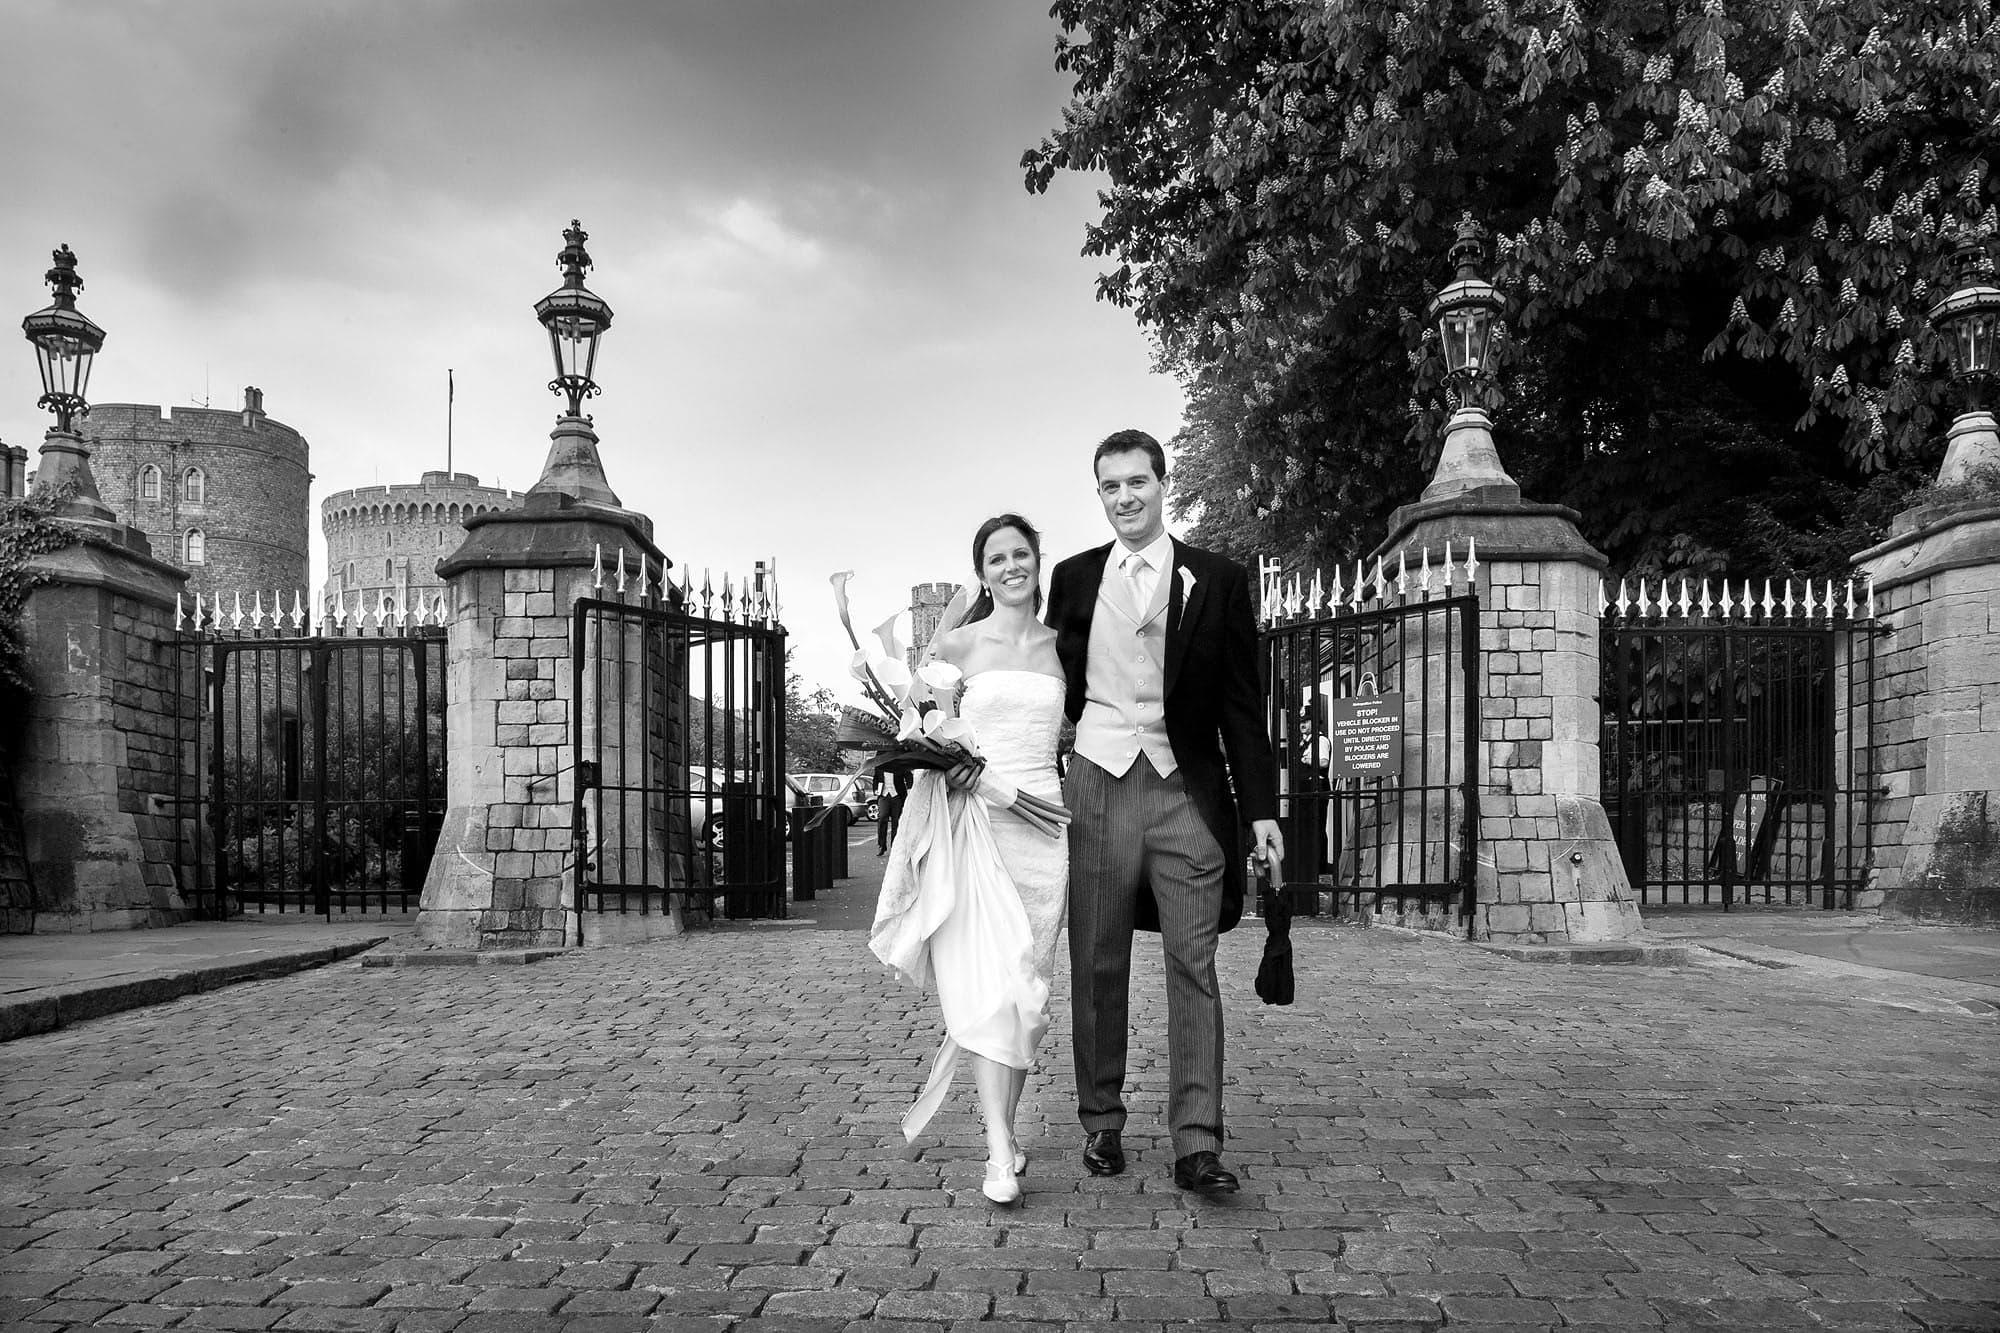 Windsor Castle wedding photography